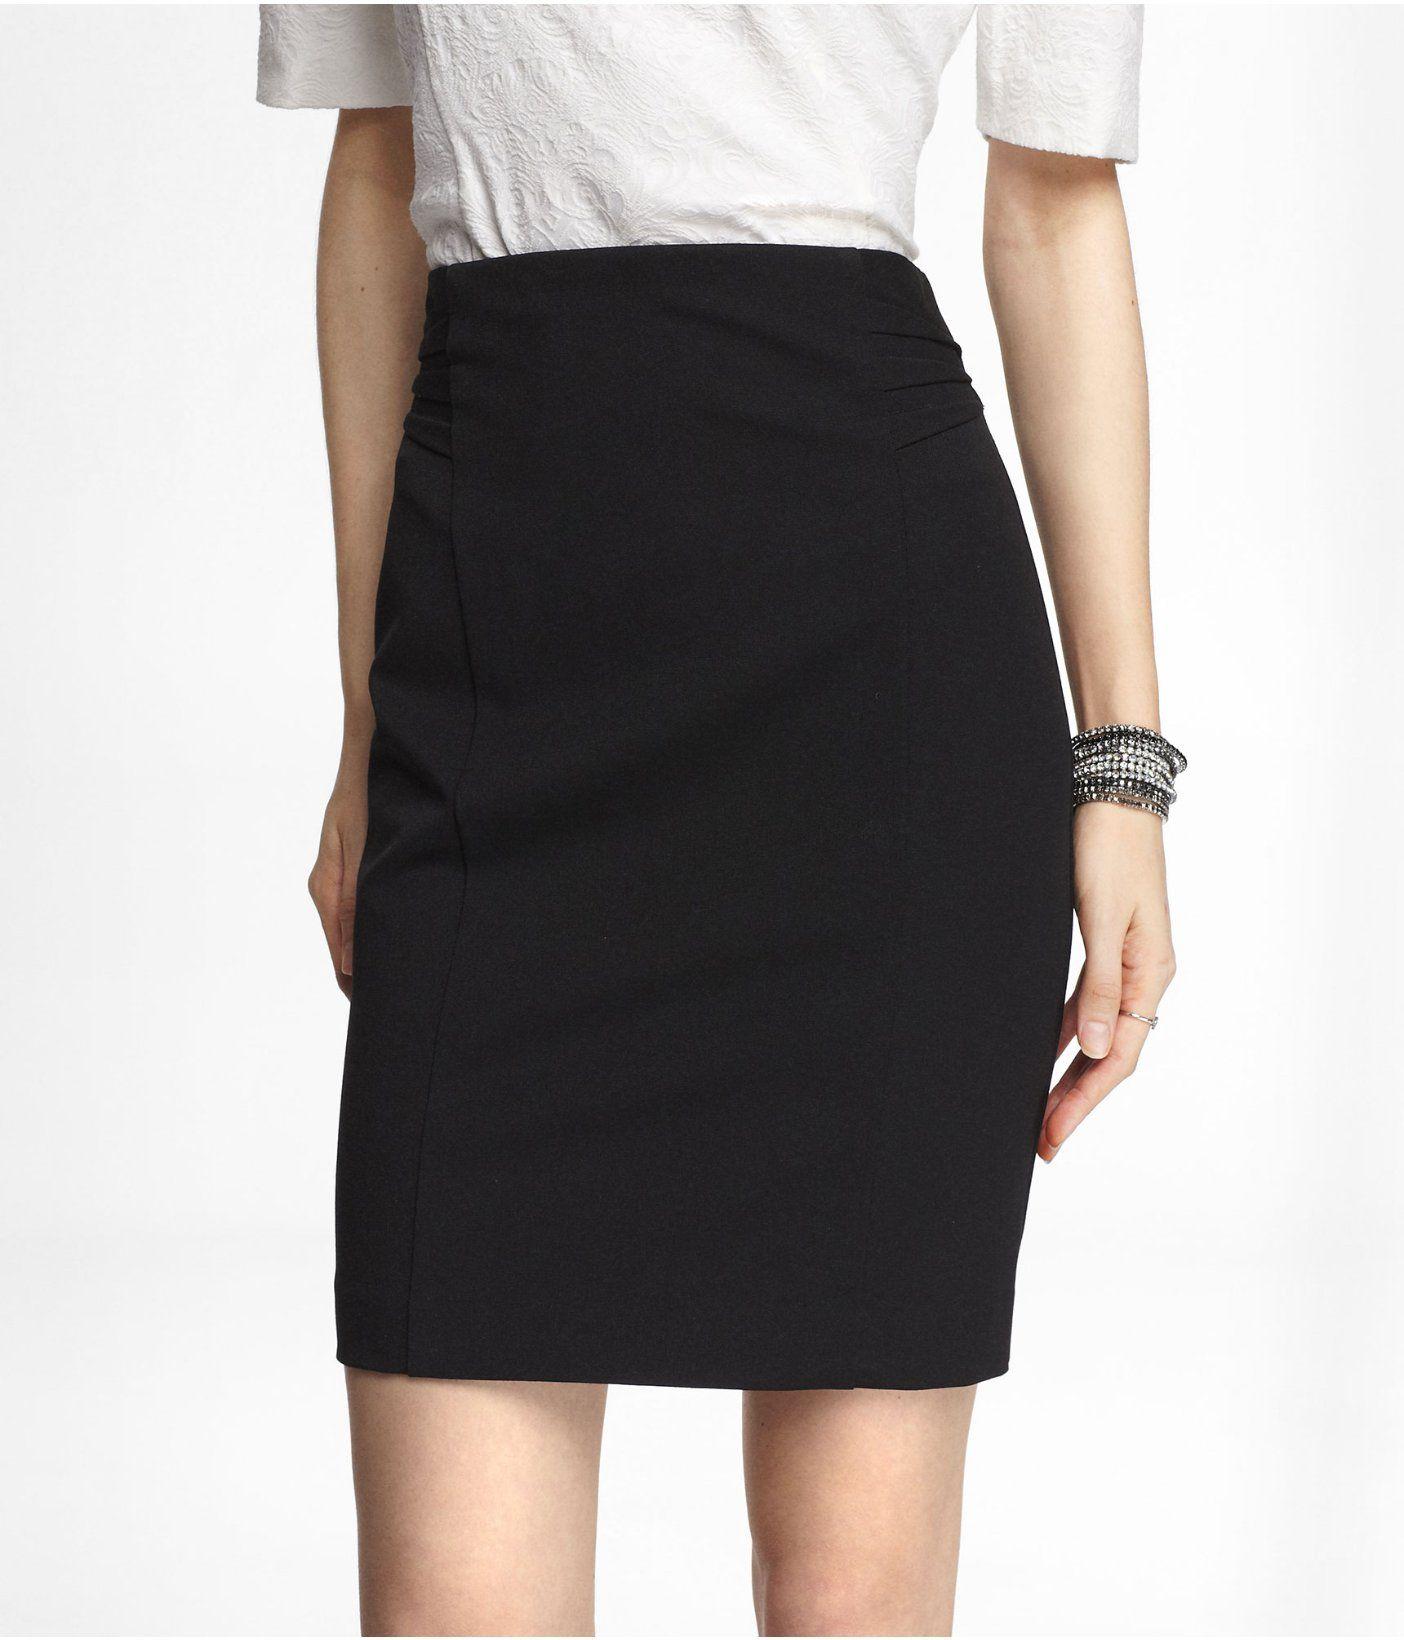 592db1ee5bdf High Waist Pintucked Pencil Skirt